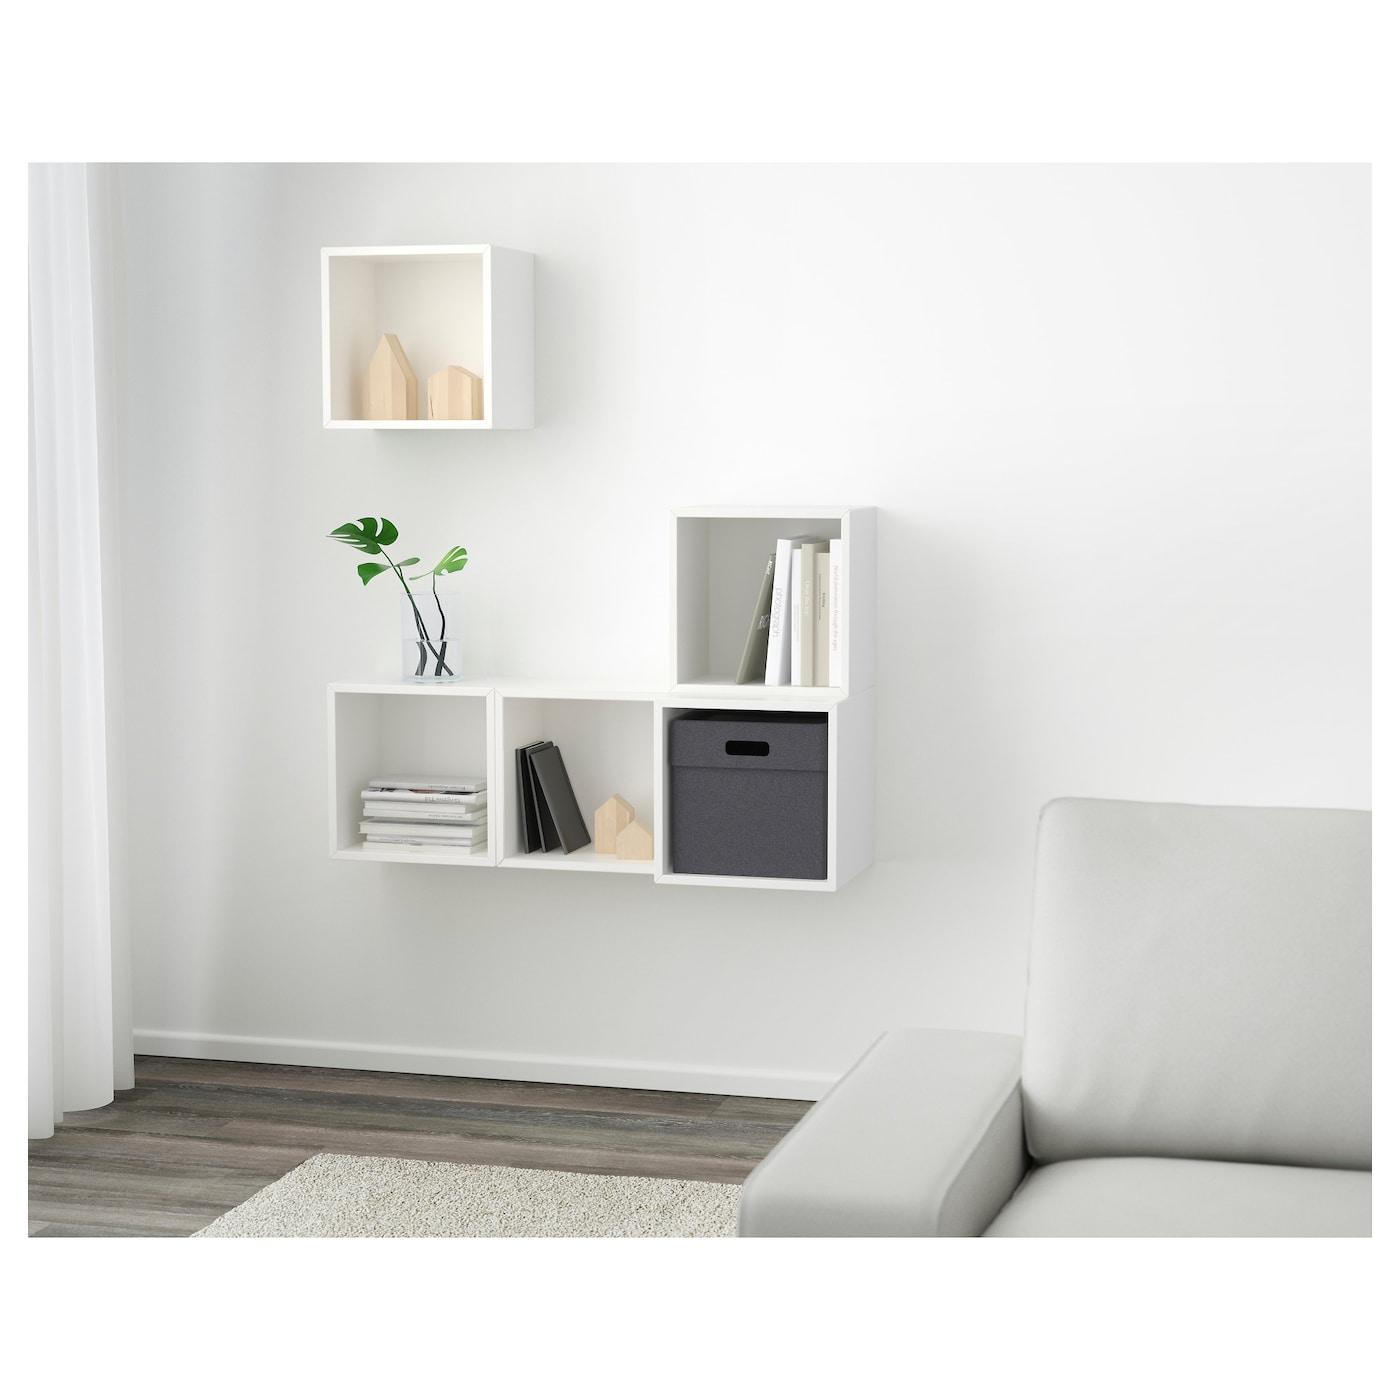 Home Mirrors Full Length Long Wall Mirror 120cm X 33cm Bedroom Furniture Vanity Long Large Home Furniture Diy Omnitel Com Na